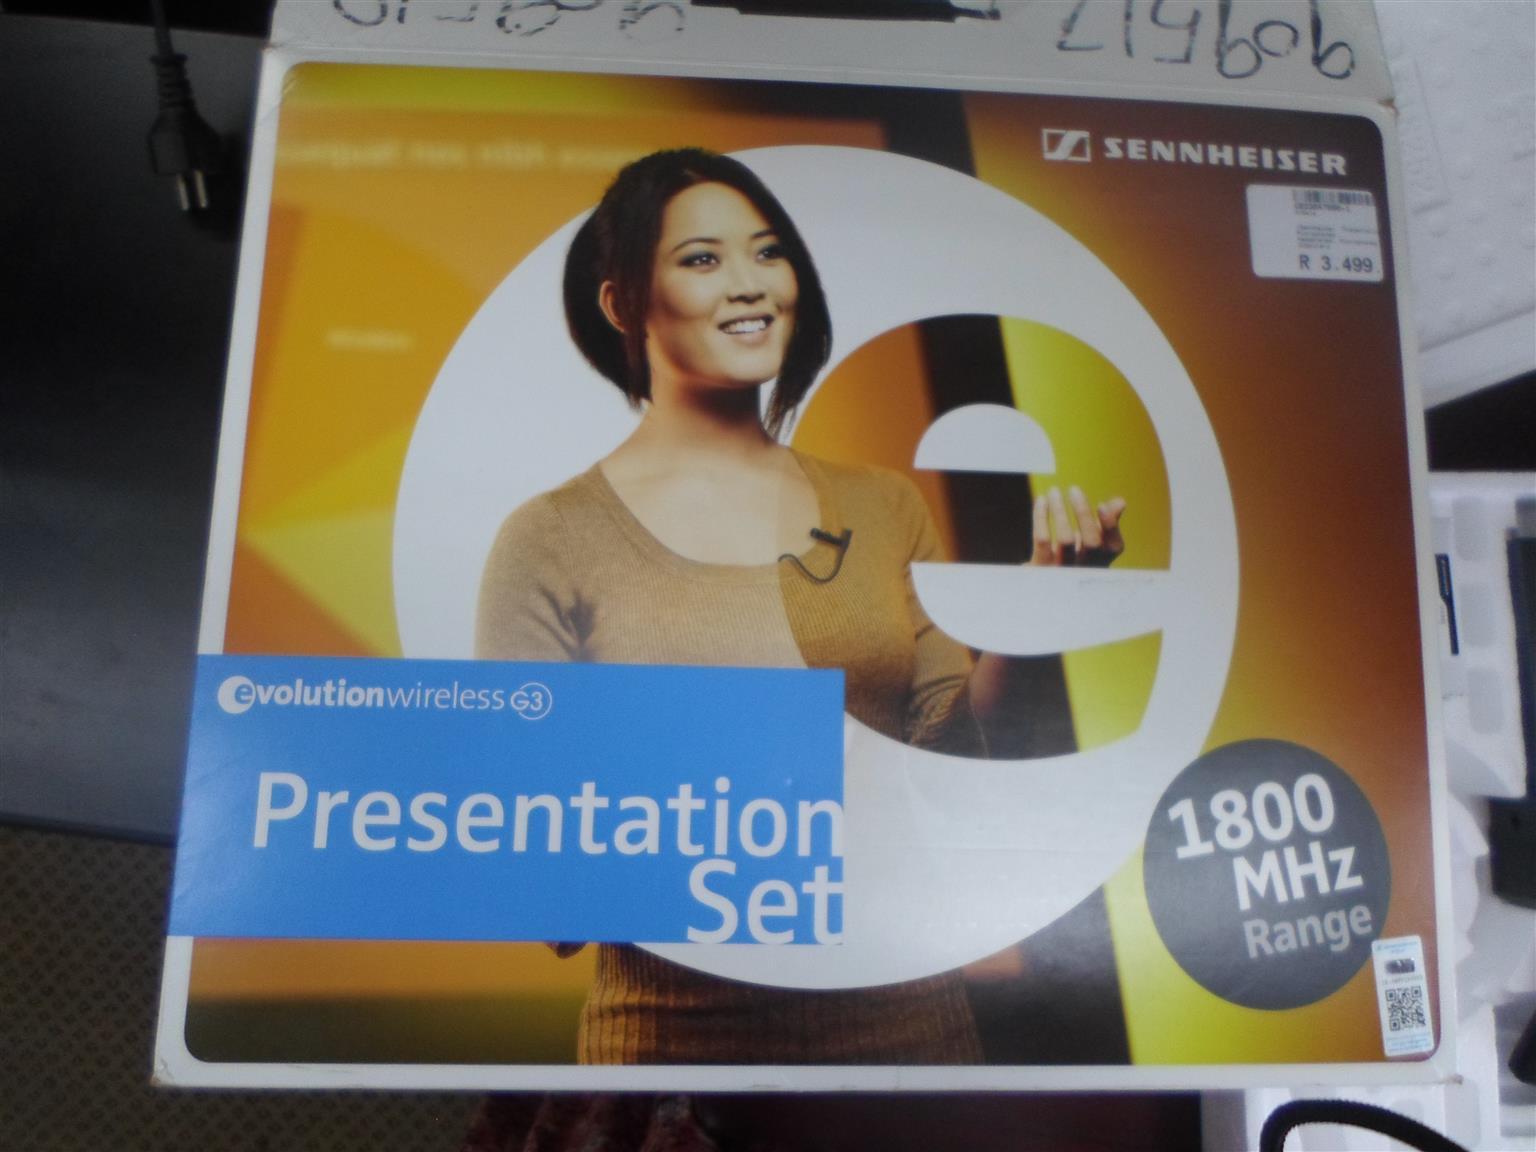 Sennheiser Presentation Set